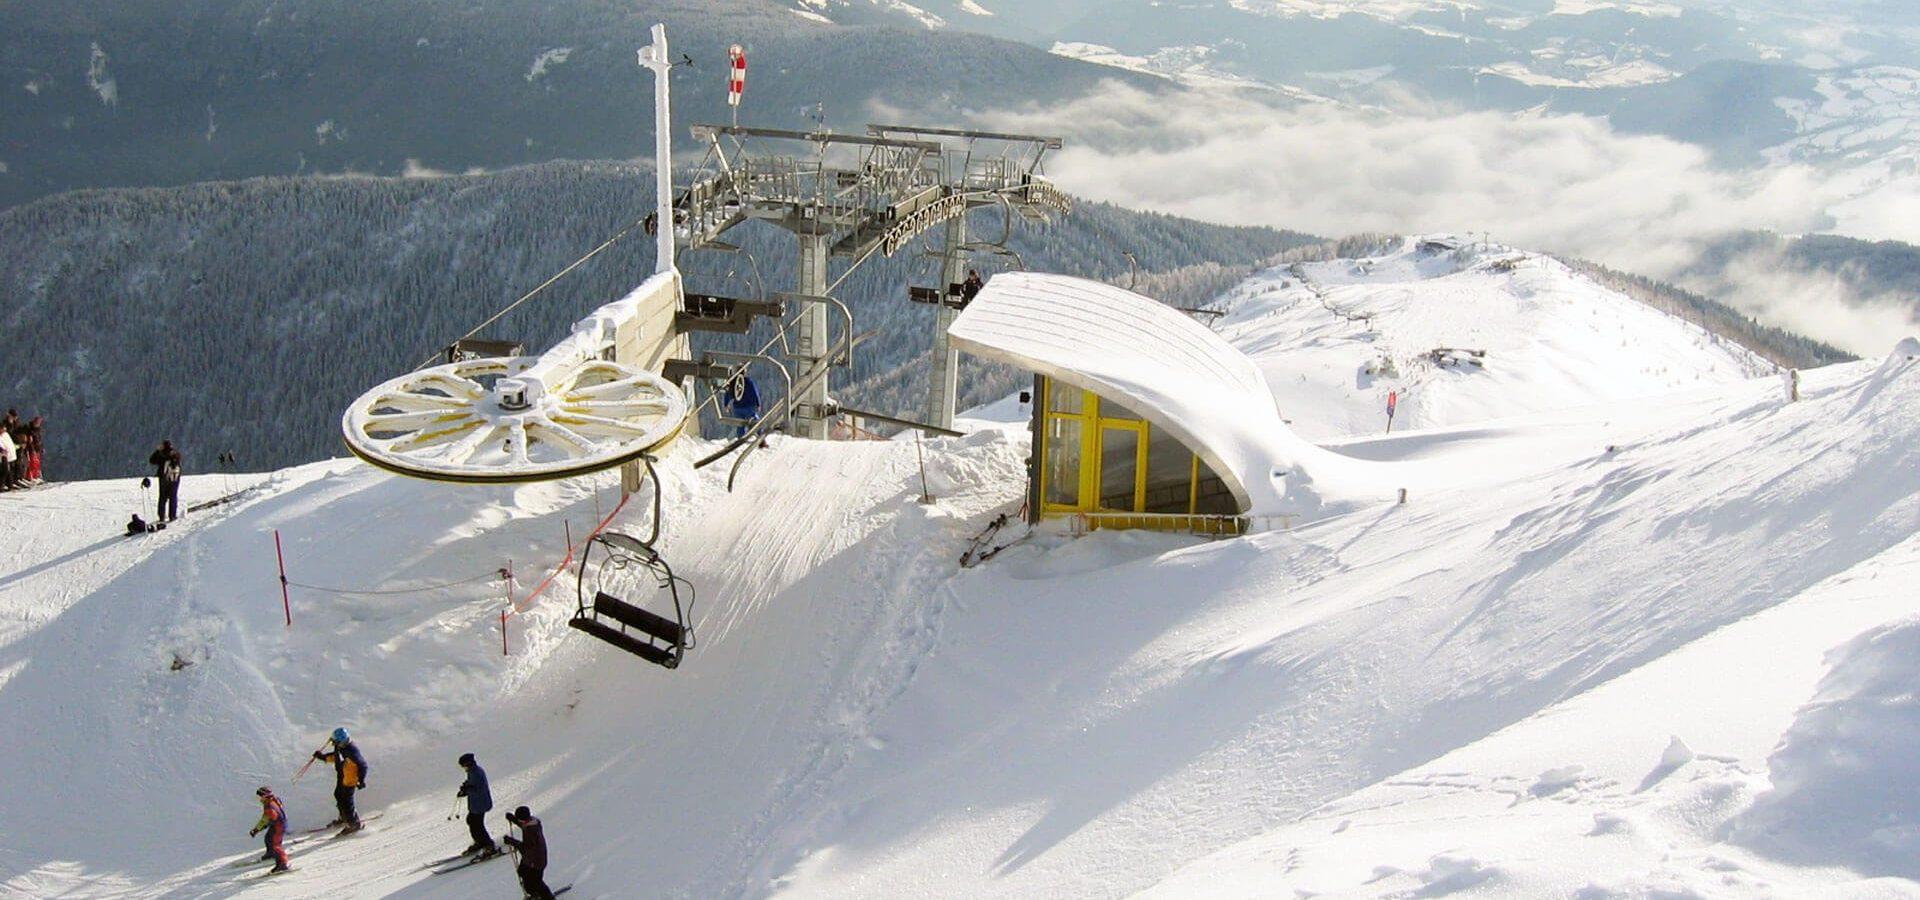 skiurlaub-meransen